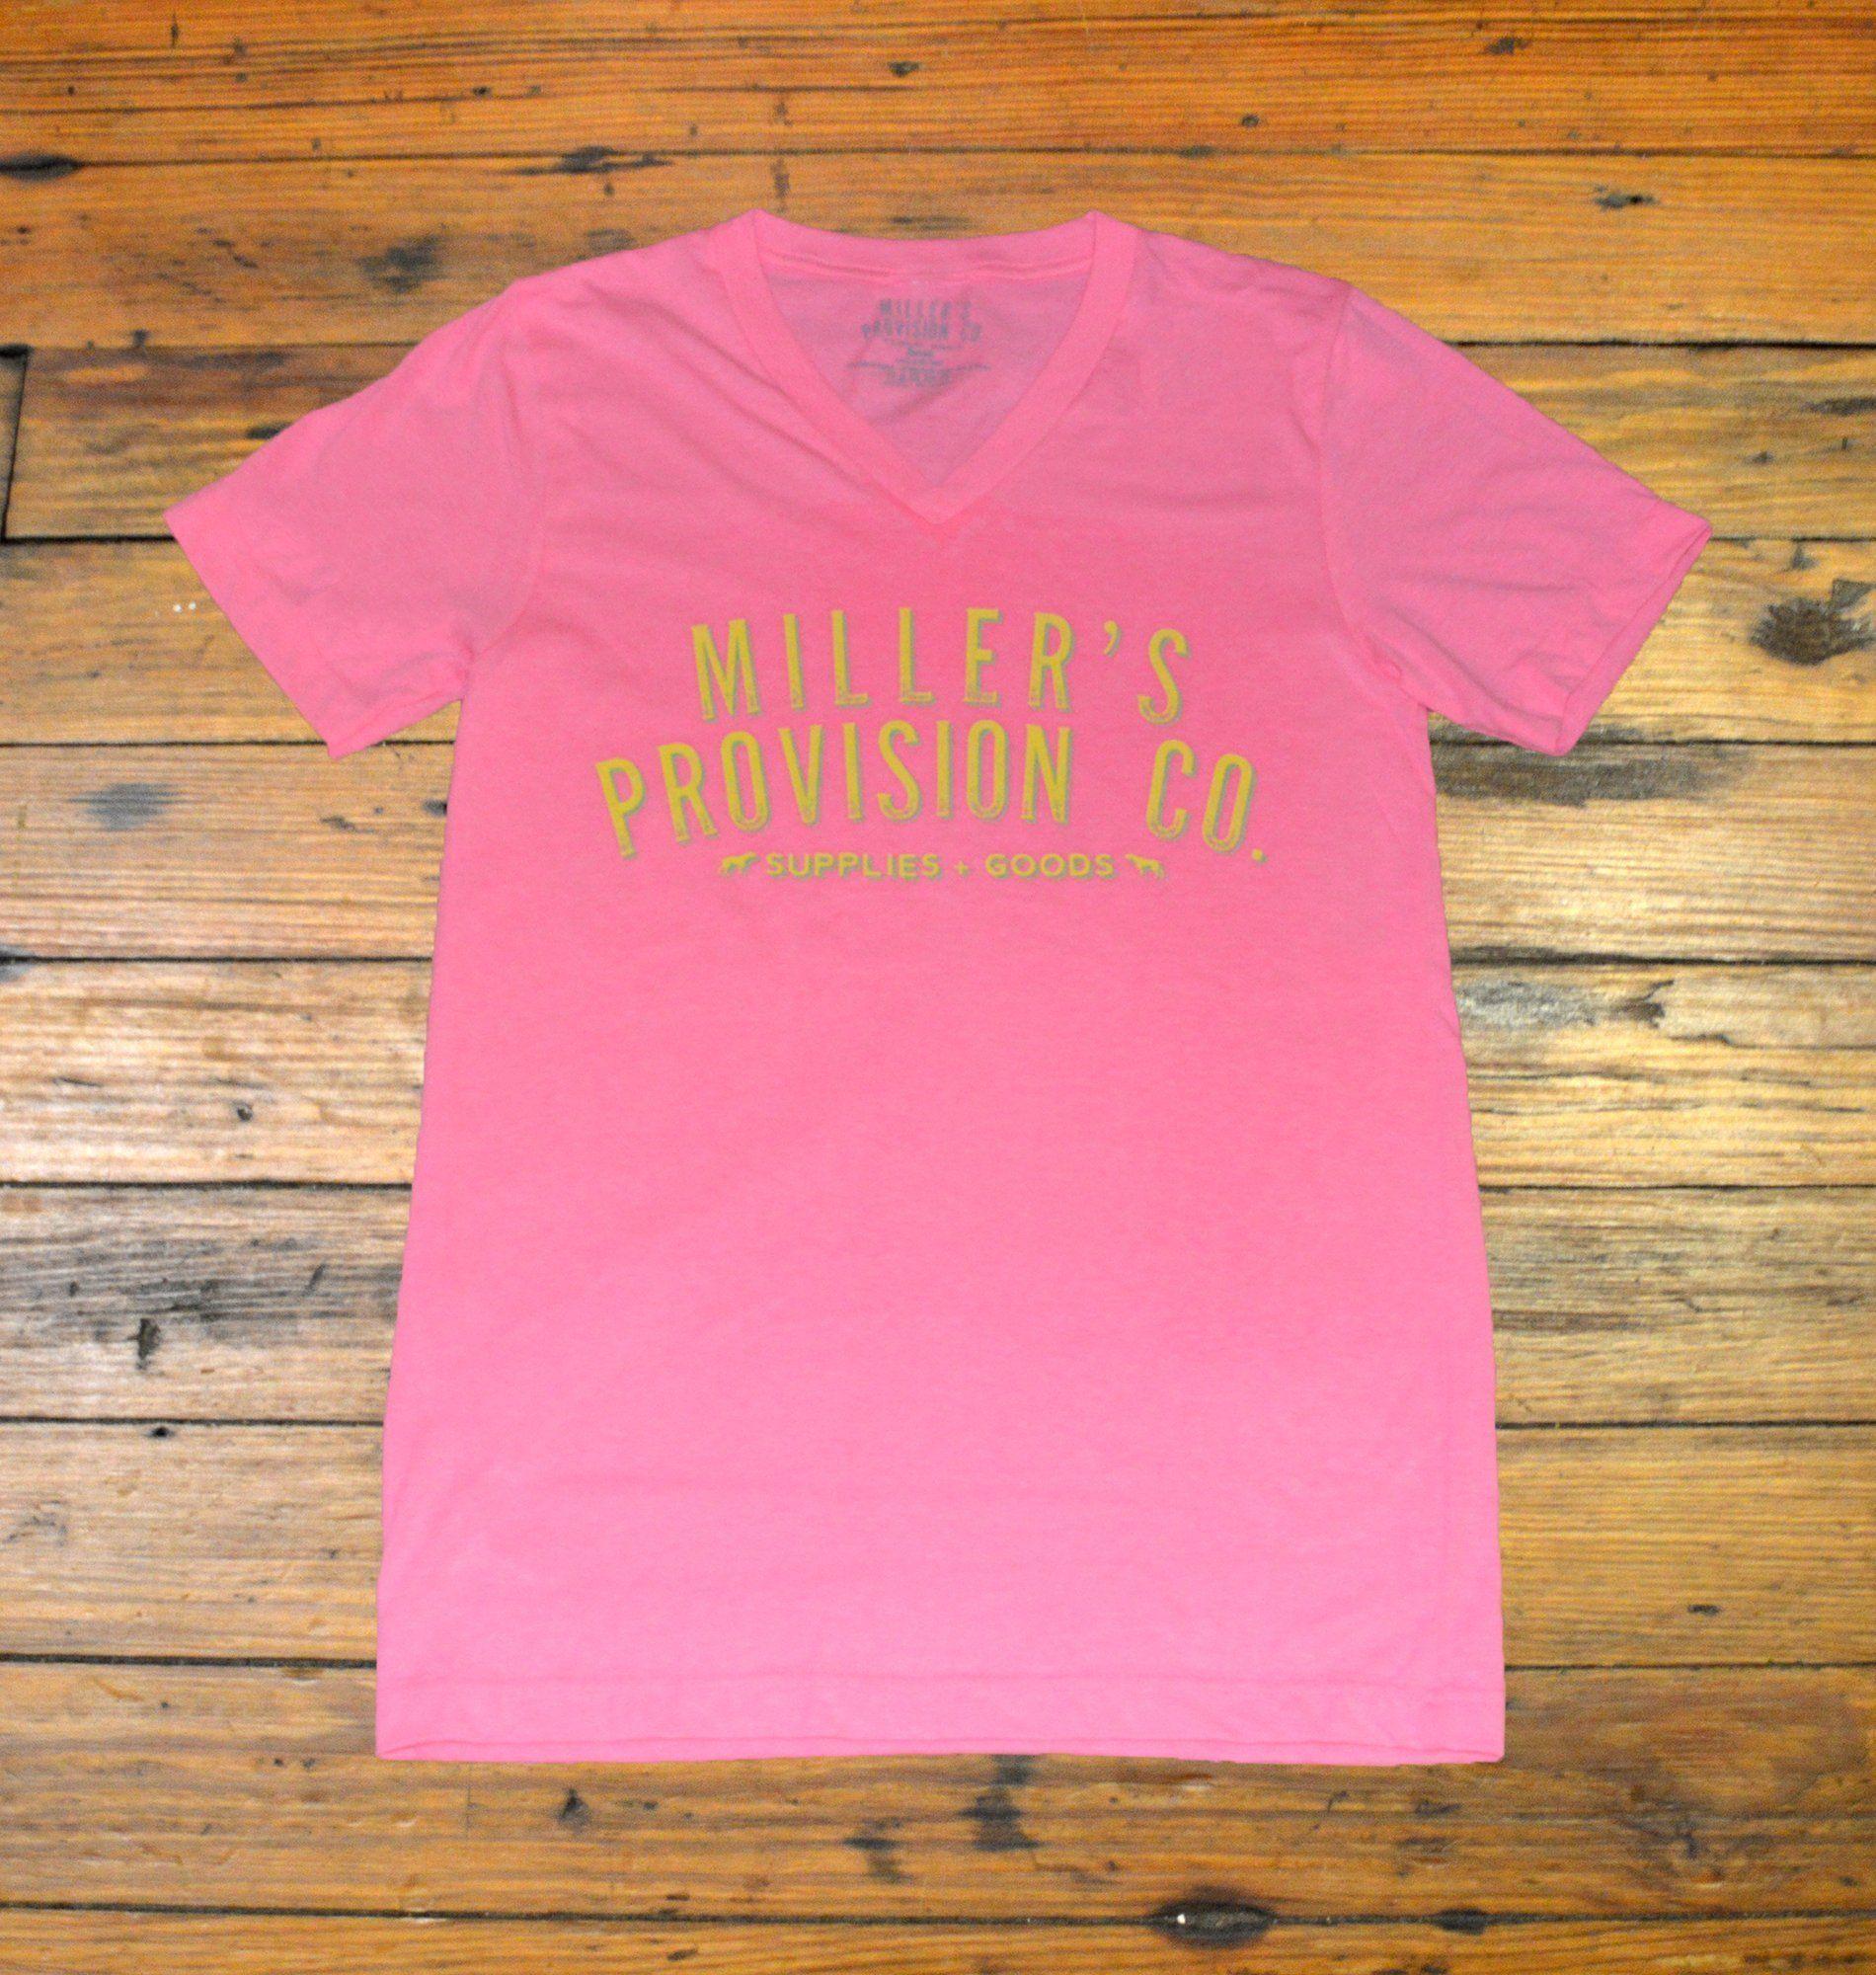 Miller's Provision Co., Neon Logo Short Sleeve VNeck, Hot